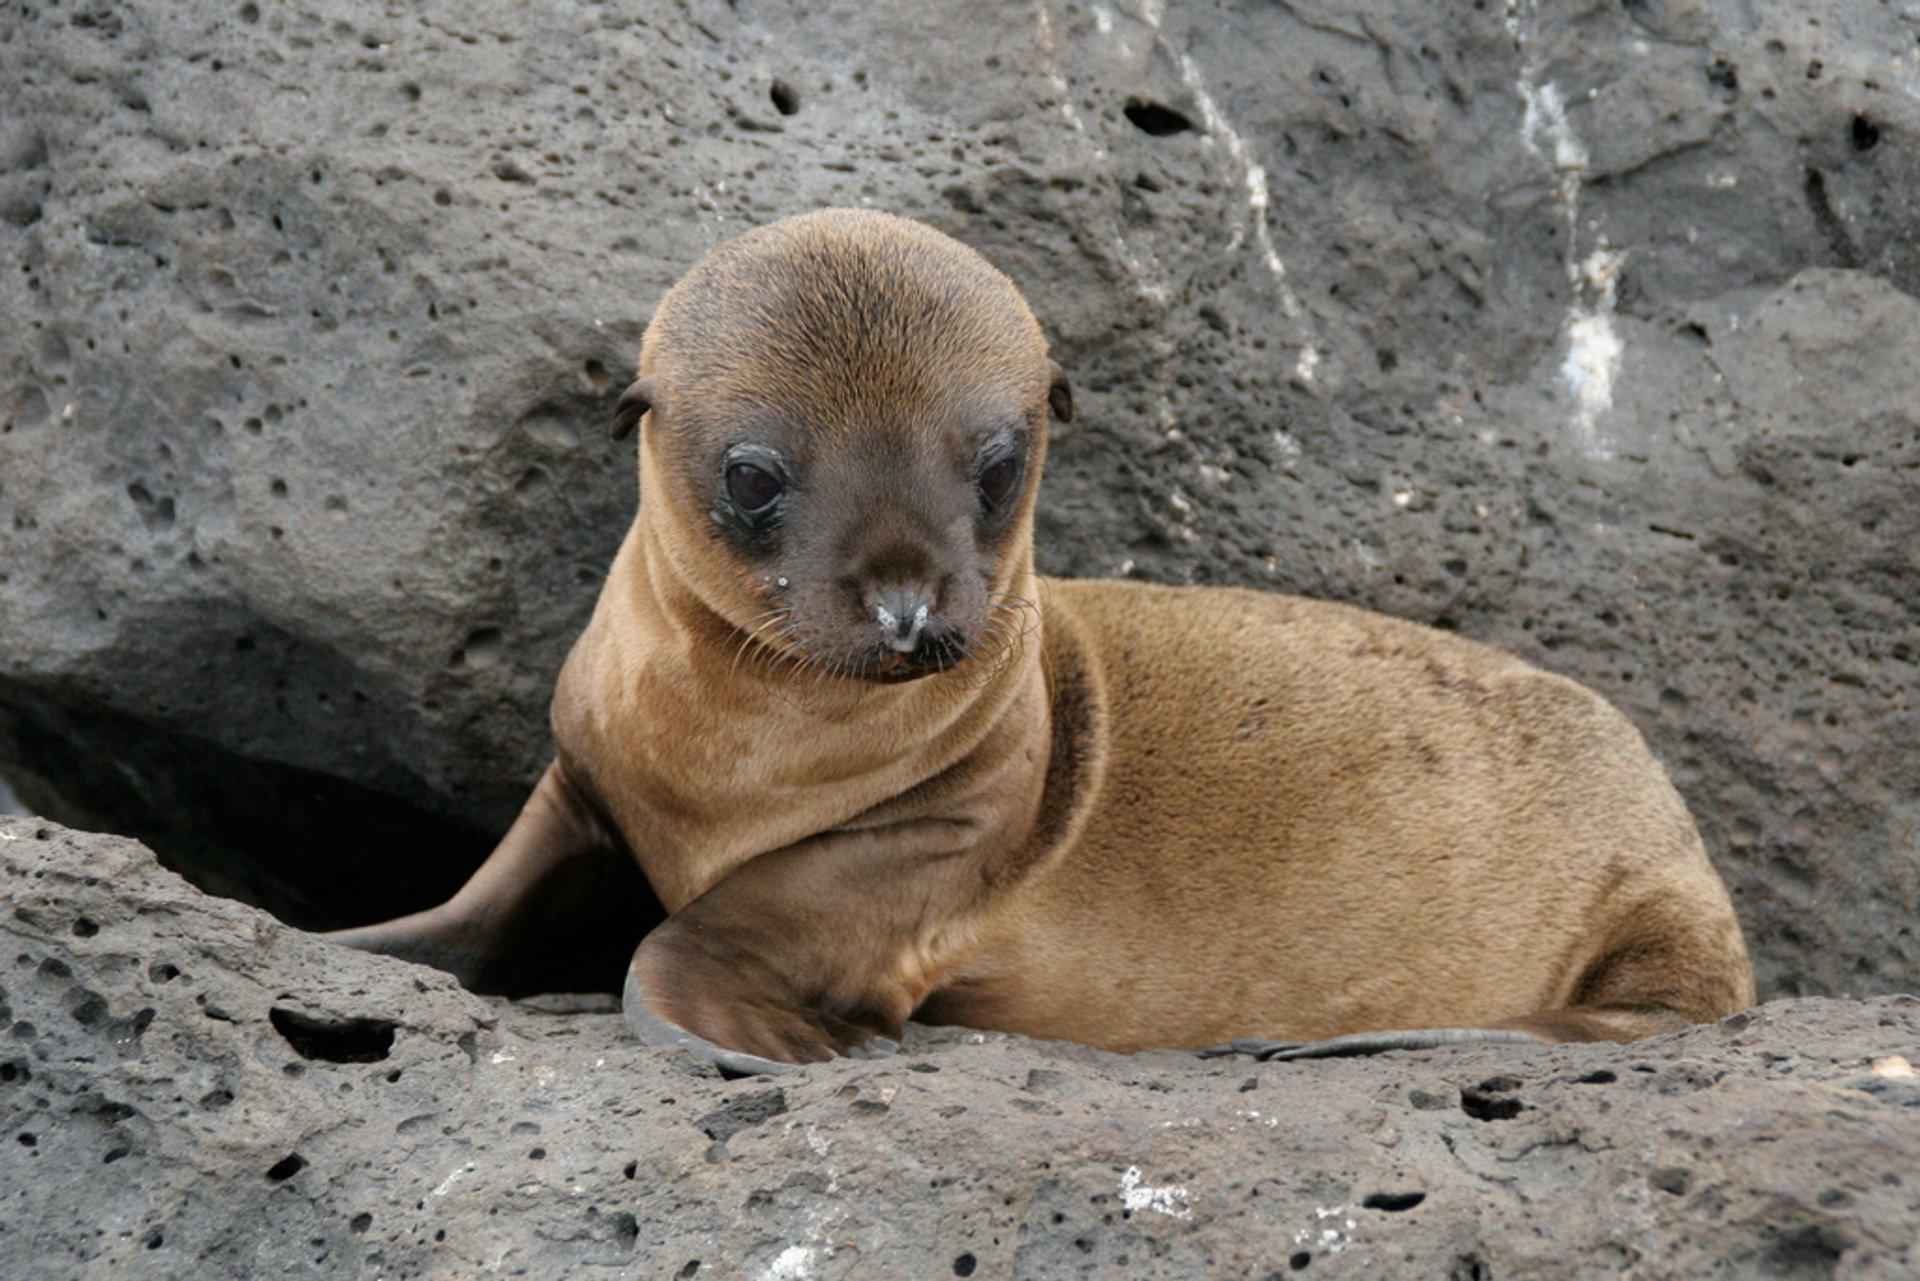 Baby Sea Lions in Galapagos Islands - Best Season 2019